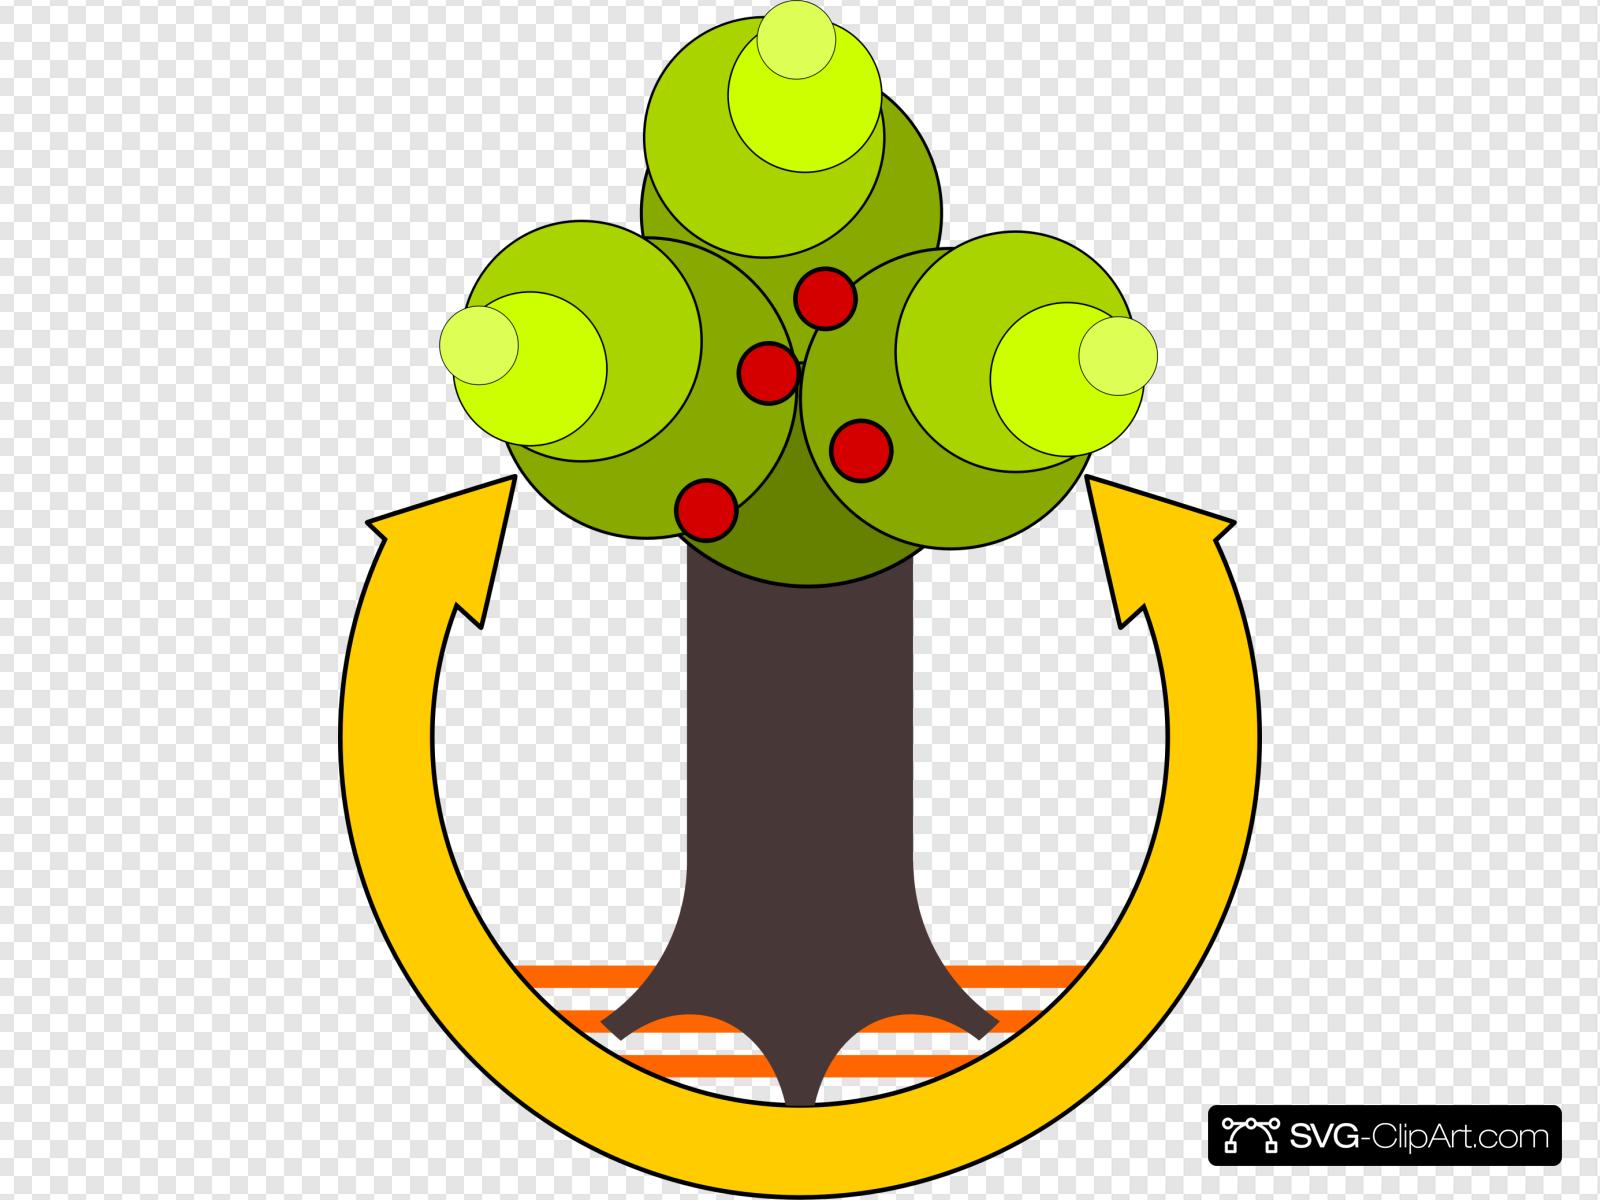 Green save clip art. Environment clipart svg